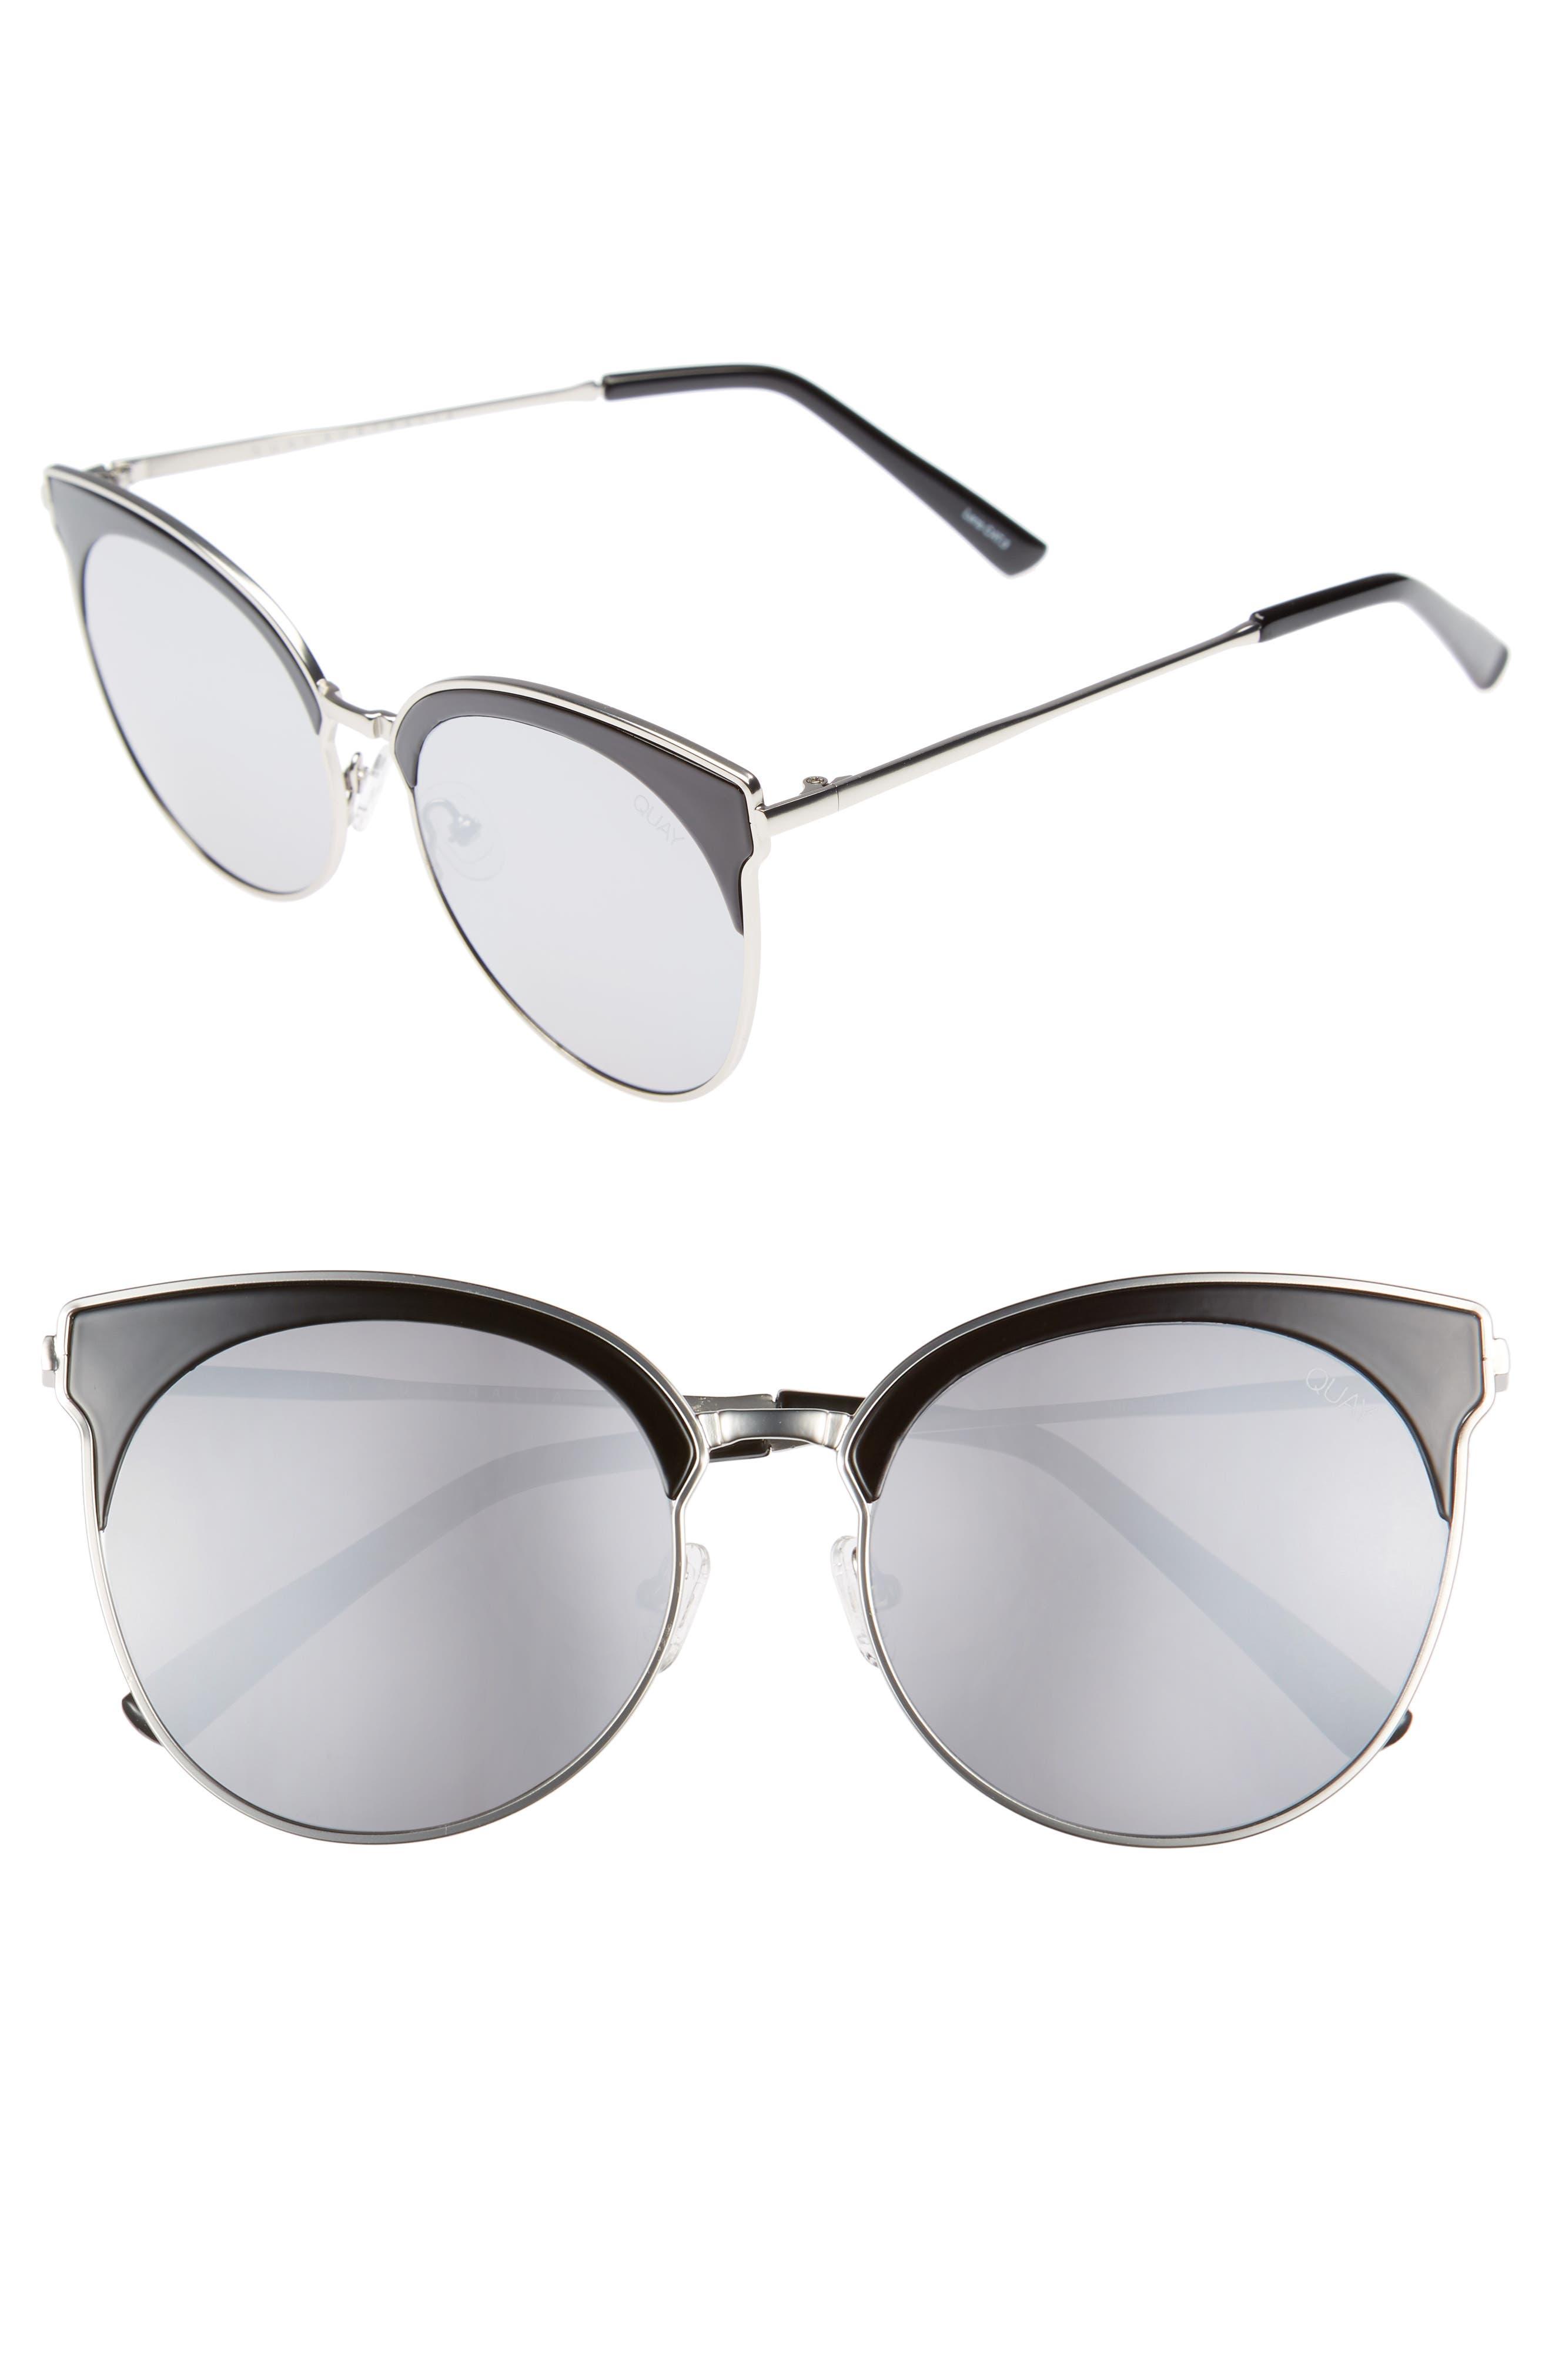 Mia Bella 56mm Sunglasses,                             Main thumbnail 1, color,                             001